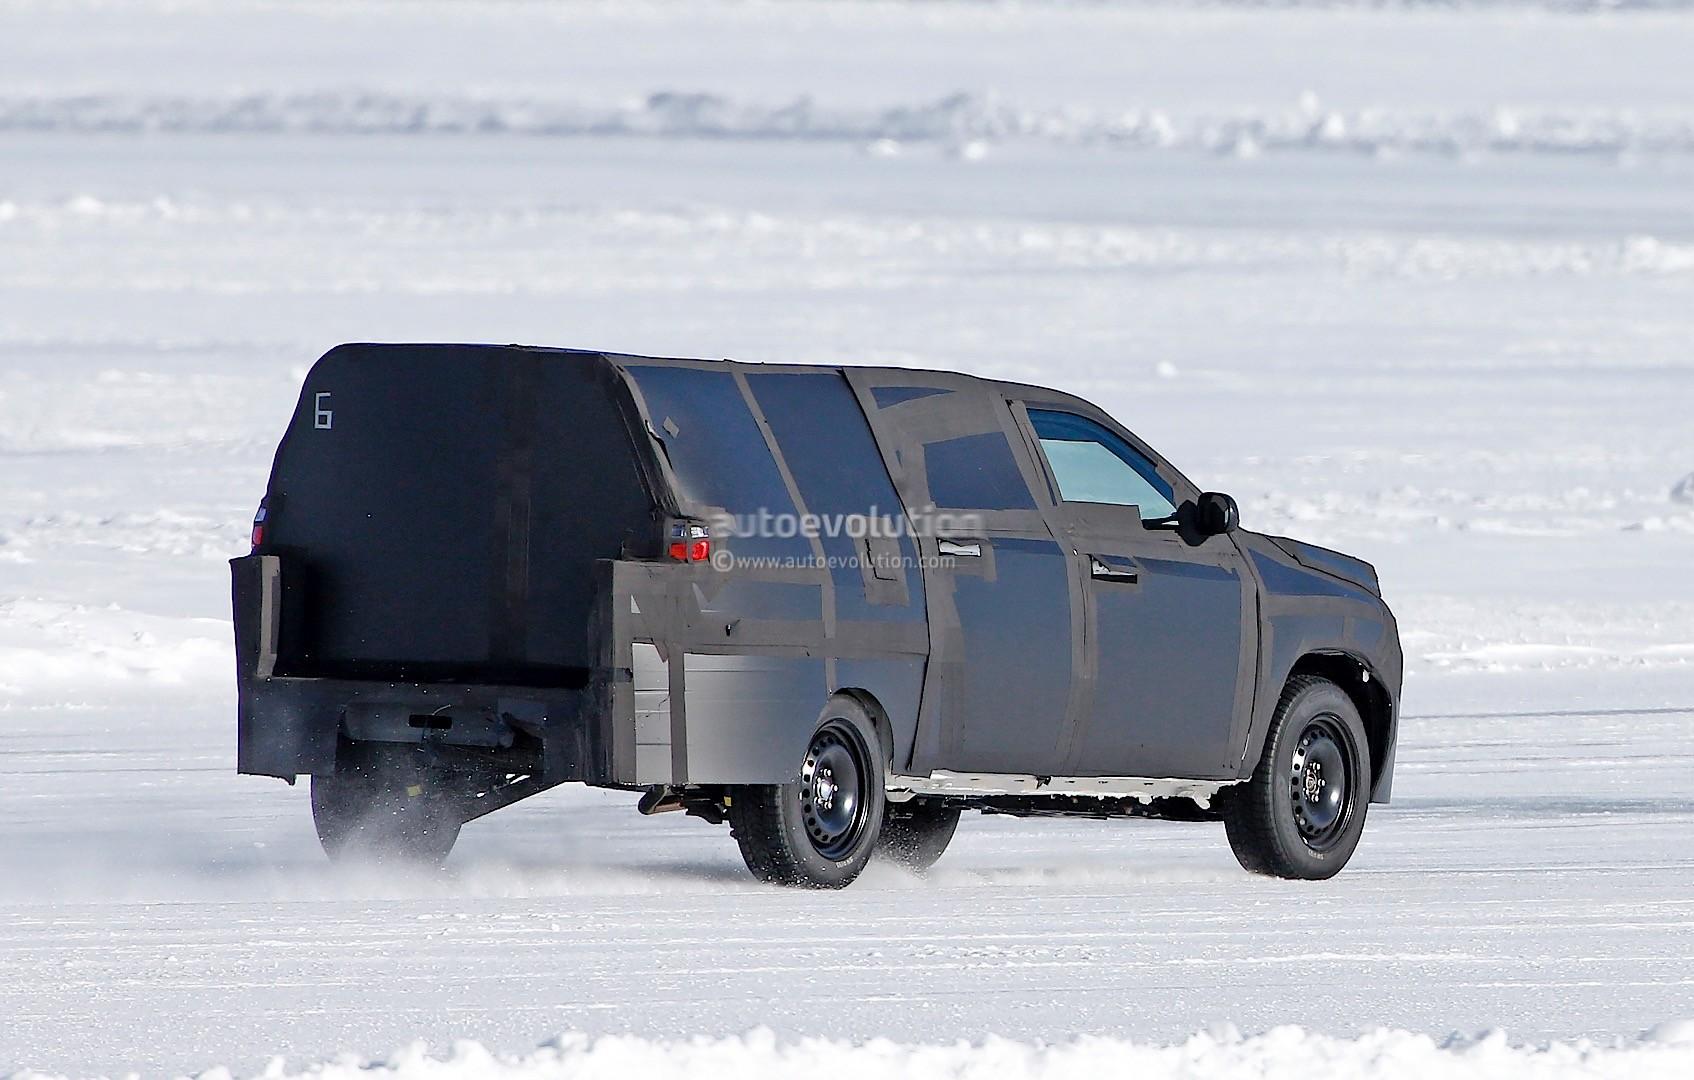 All New Dodge Dakota Mid Size Ram Pickup Truck Spied Testing Photo Gallery on Dodge Dakota Engine Size